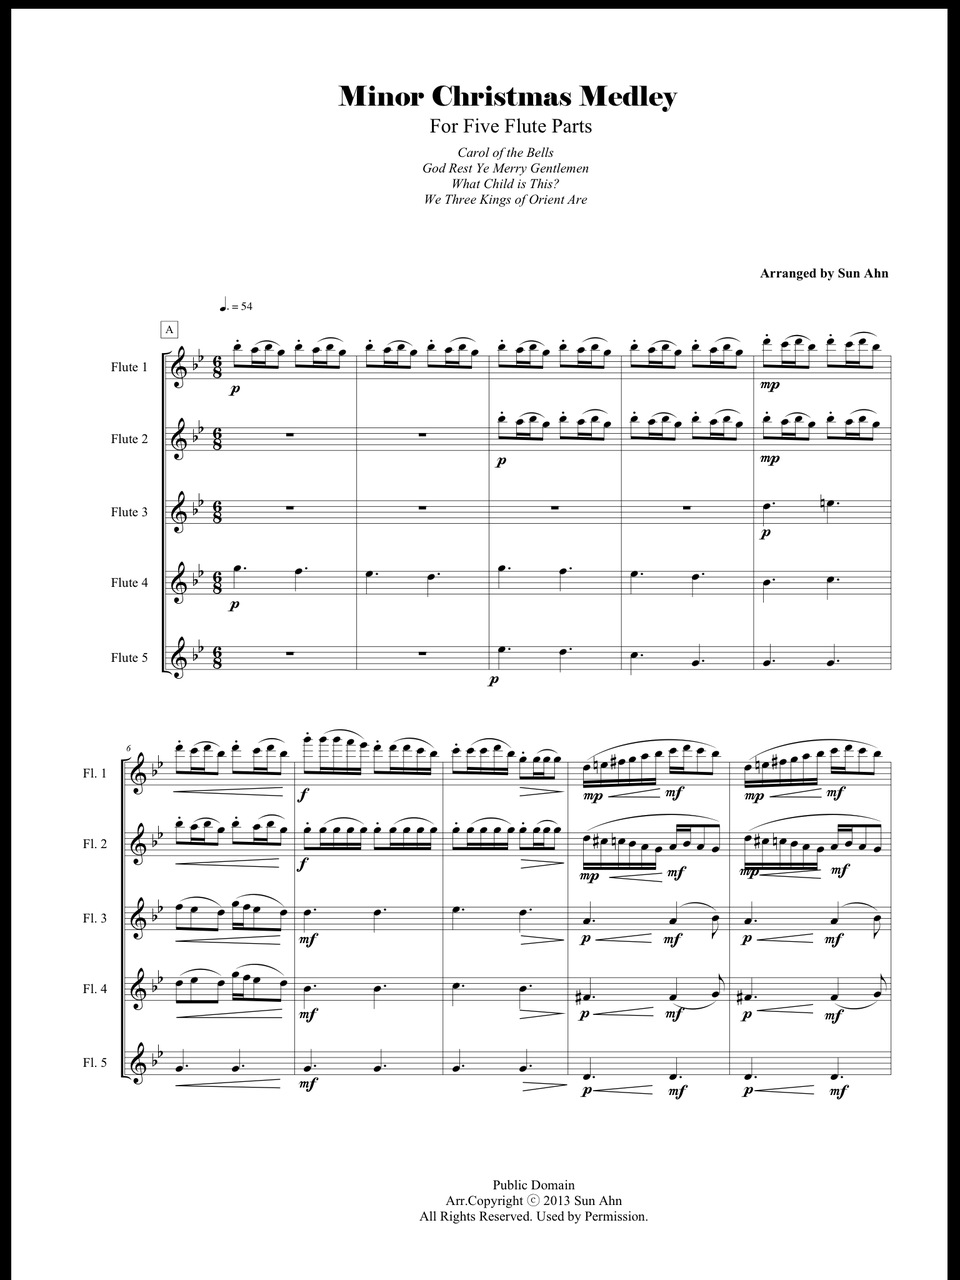 Marvelous Minor Christmas Medley For Five Flute Parts Sun Ahn Music Wiring Database Gramgelartorg